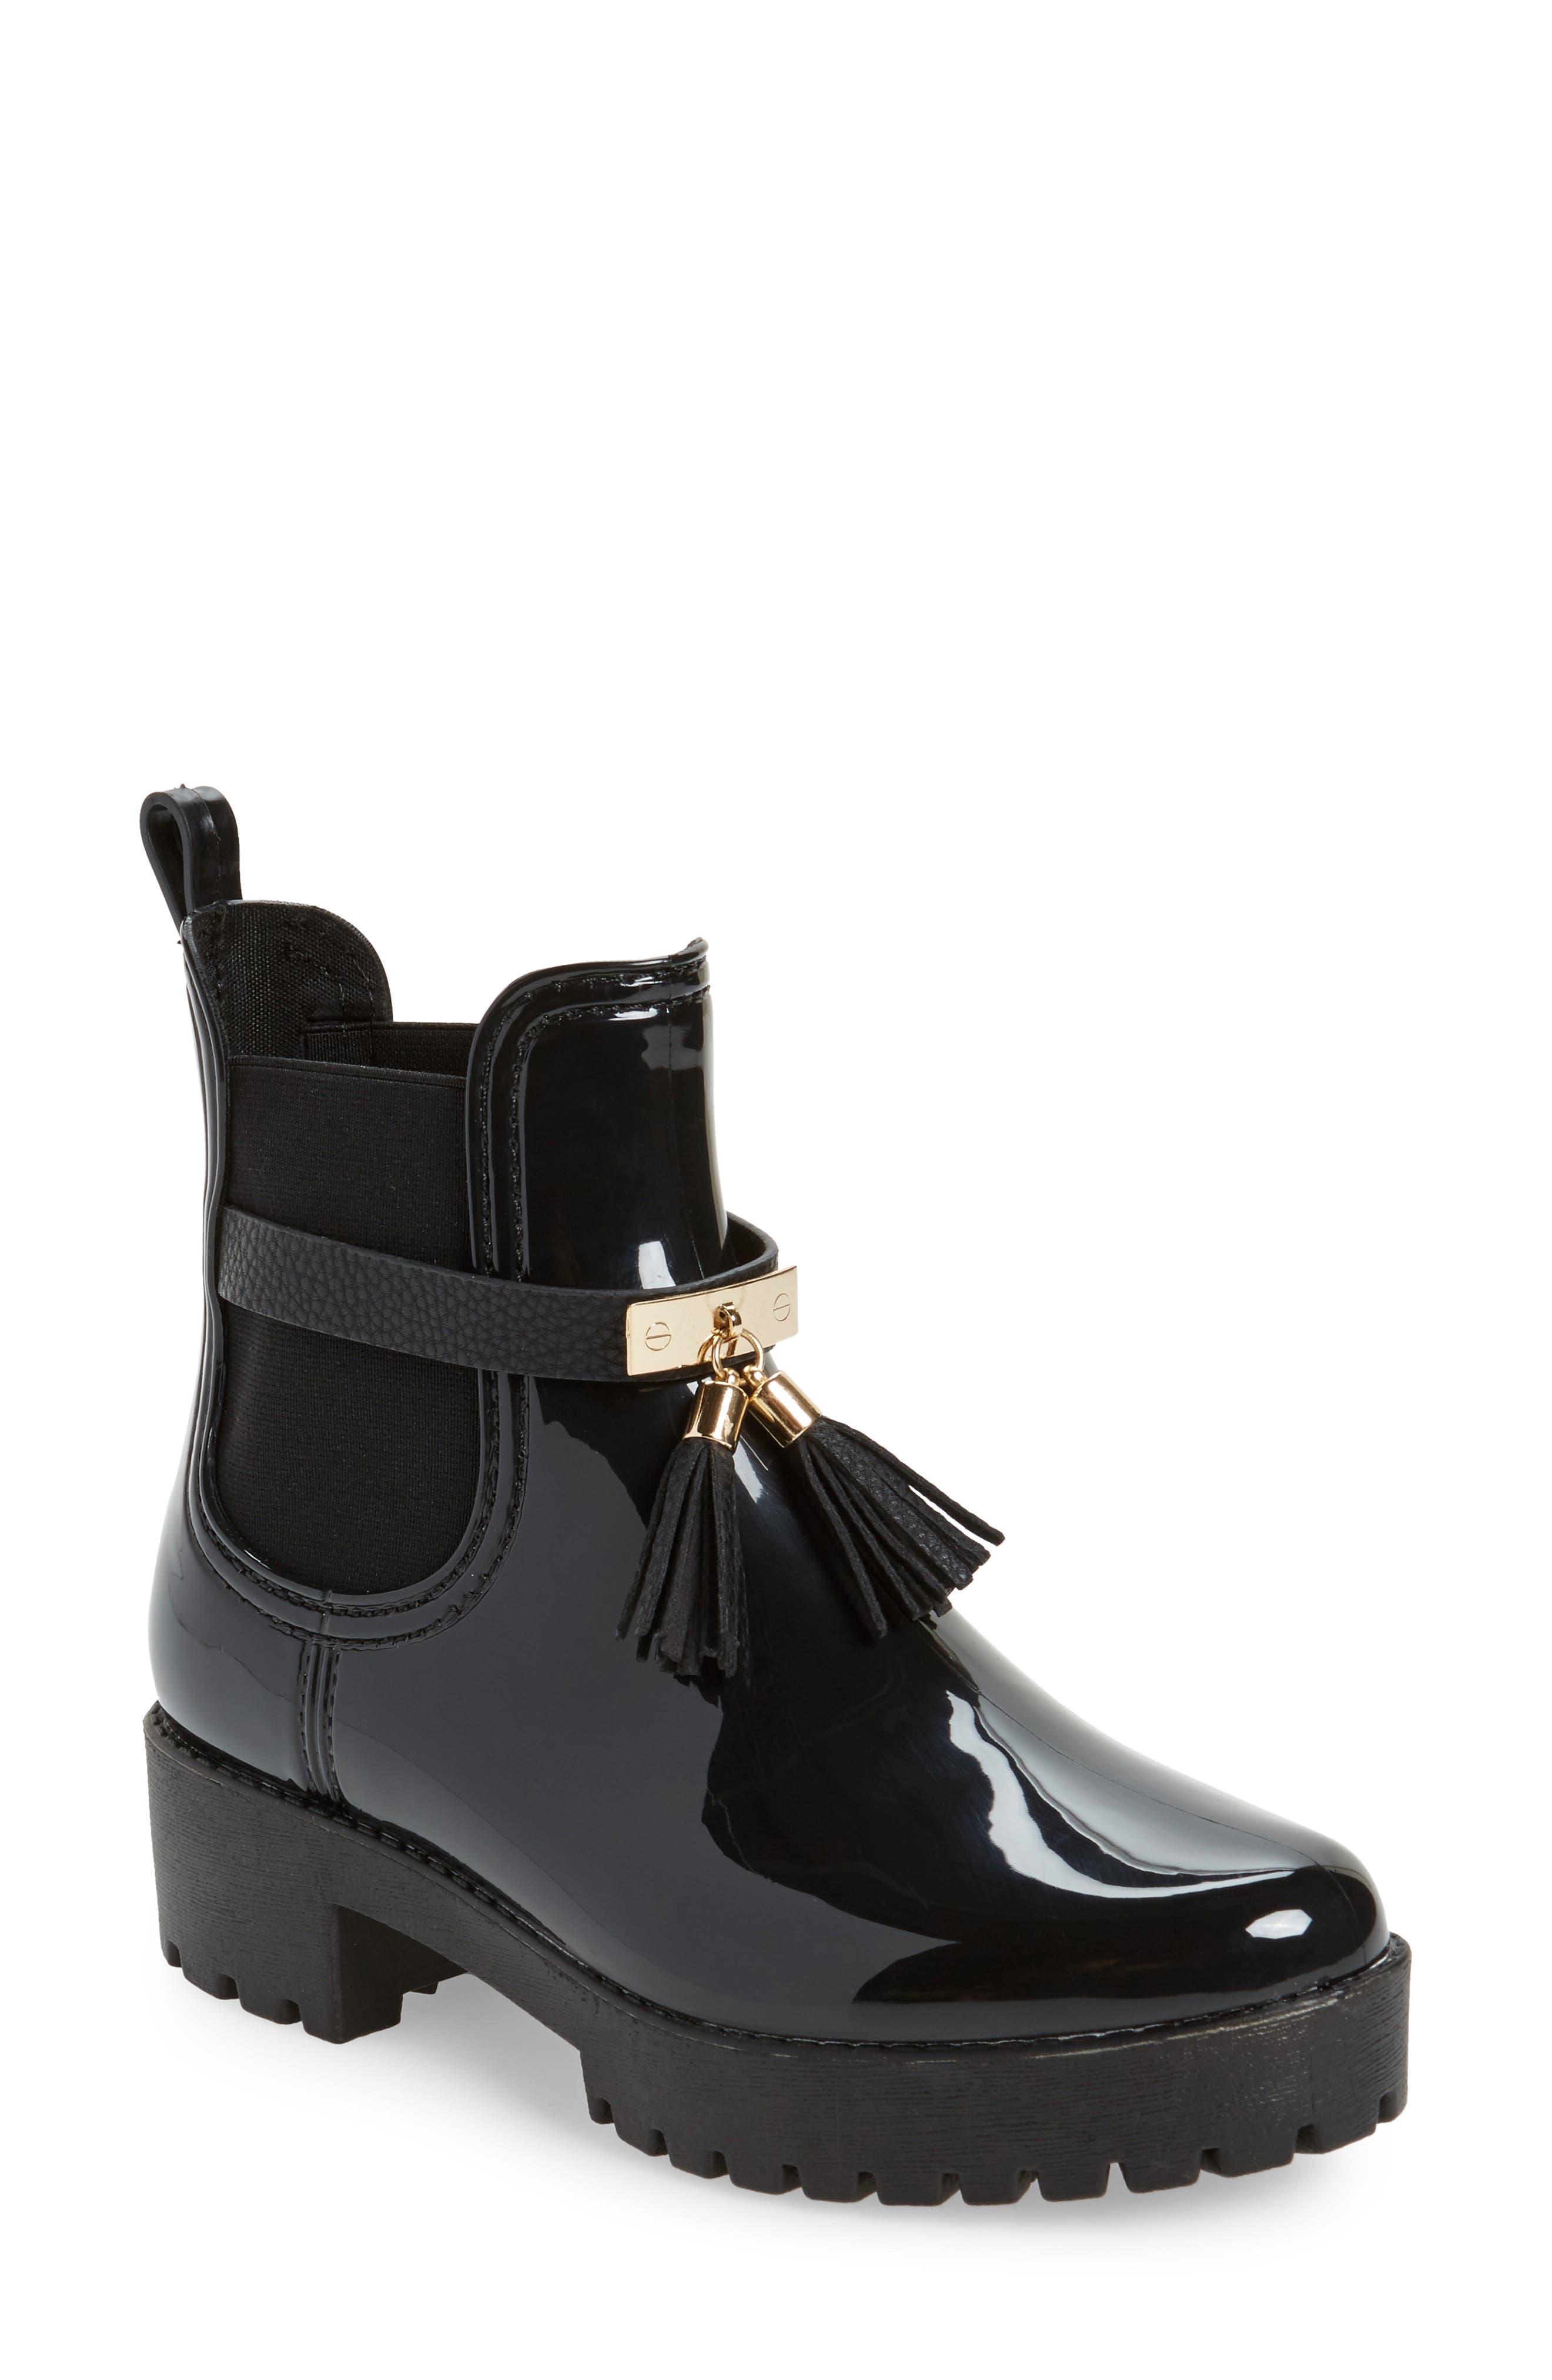 Leeds Tassel Waterproof Chelsea Boot,                         Main,                         color, 001